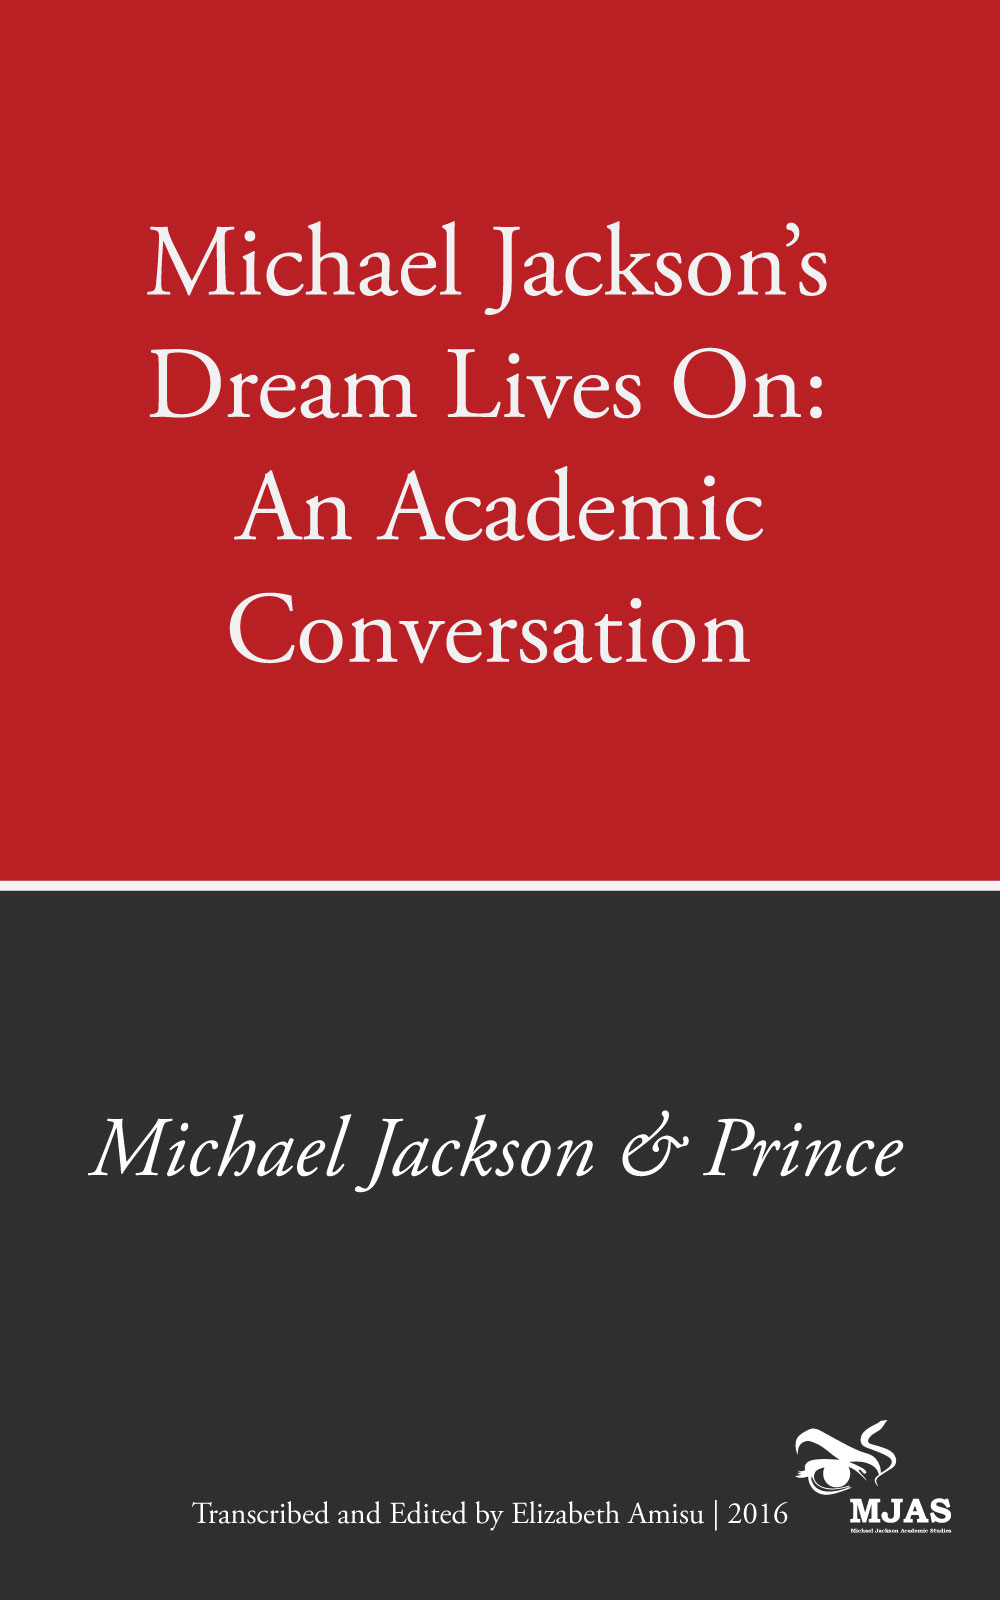 Michael Jackson and Prince Book Cover The Journal of Michael Jackson Academic Studies